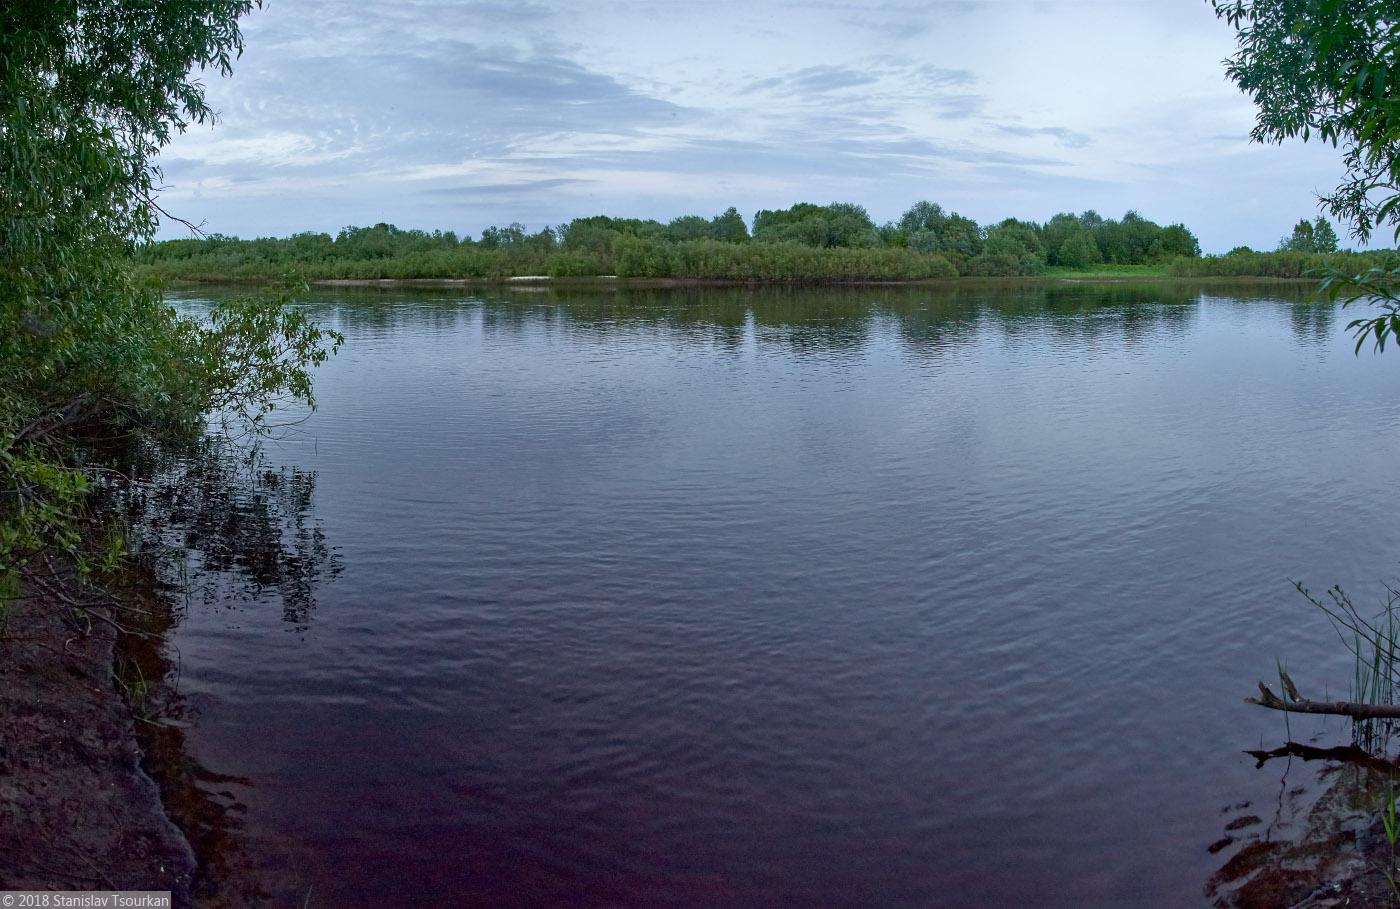 Пудож, Карелия, республика Карелия, парк Горького, река Водла